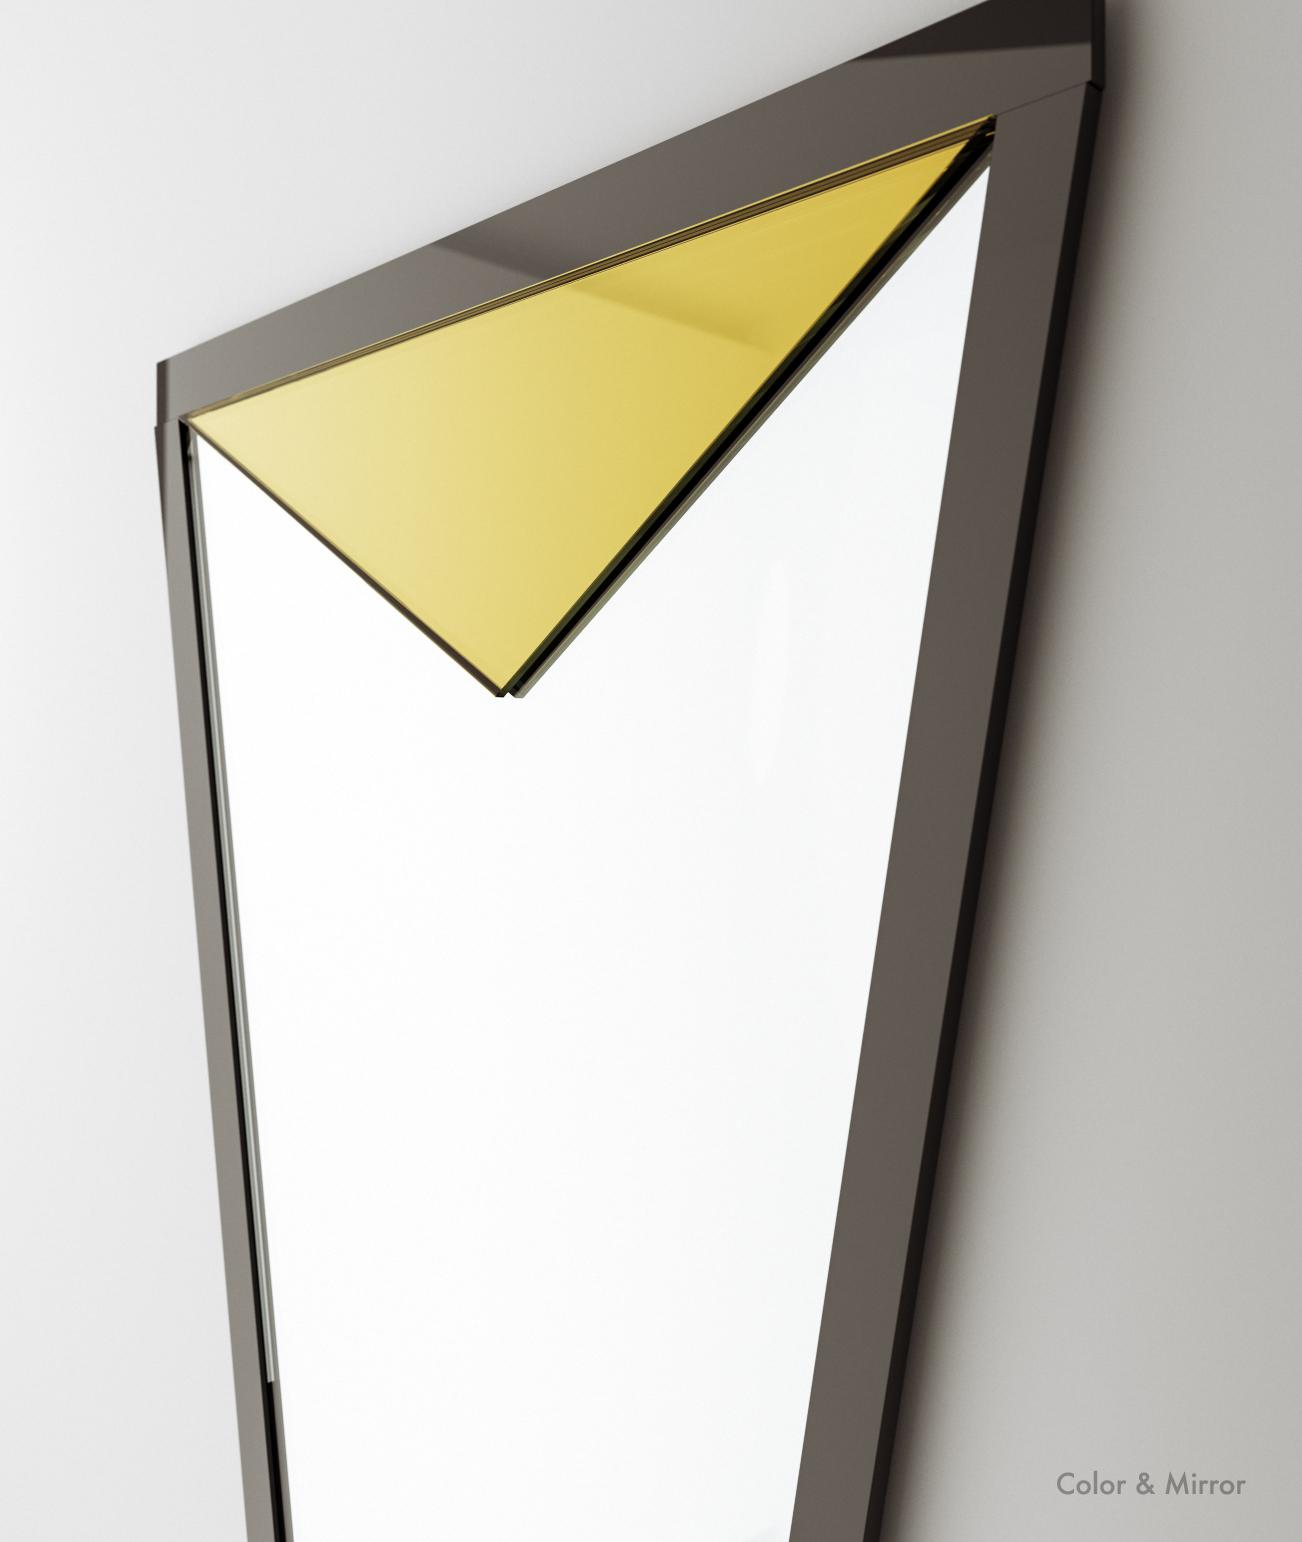 Detailed photo of golden mirror